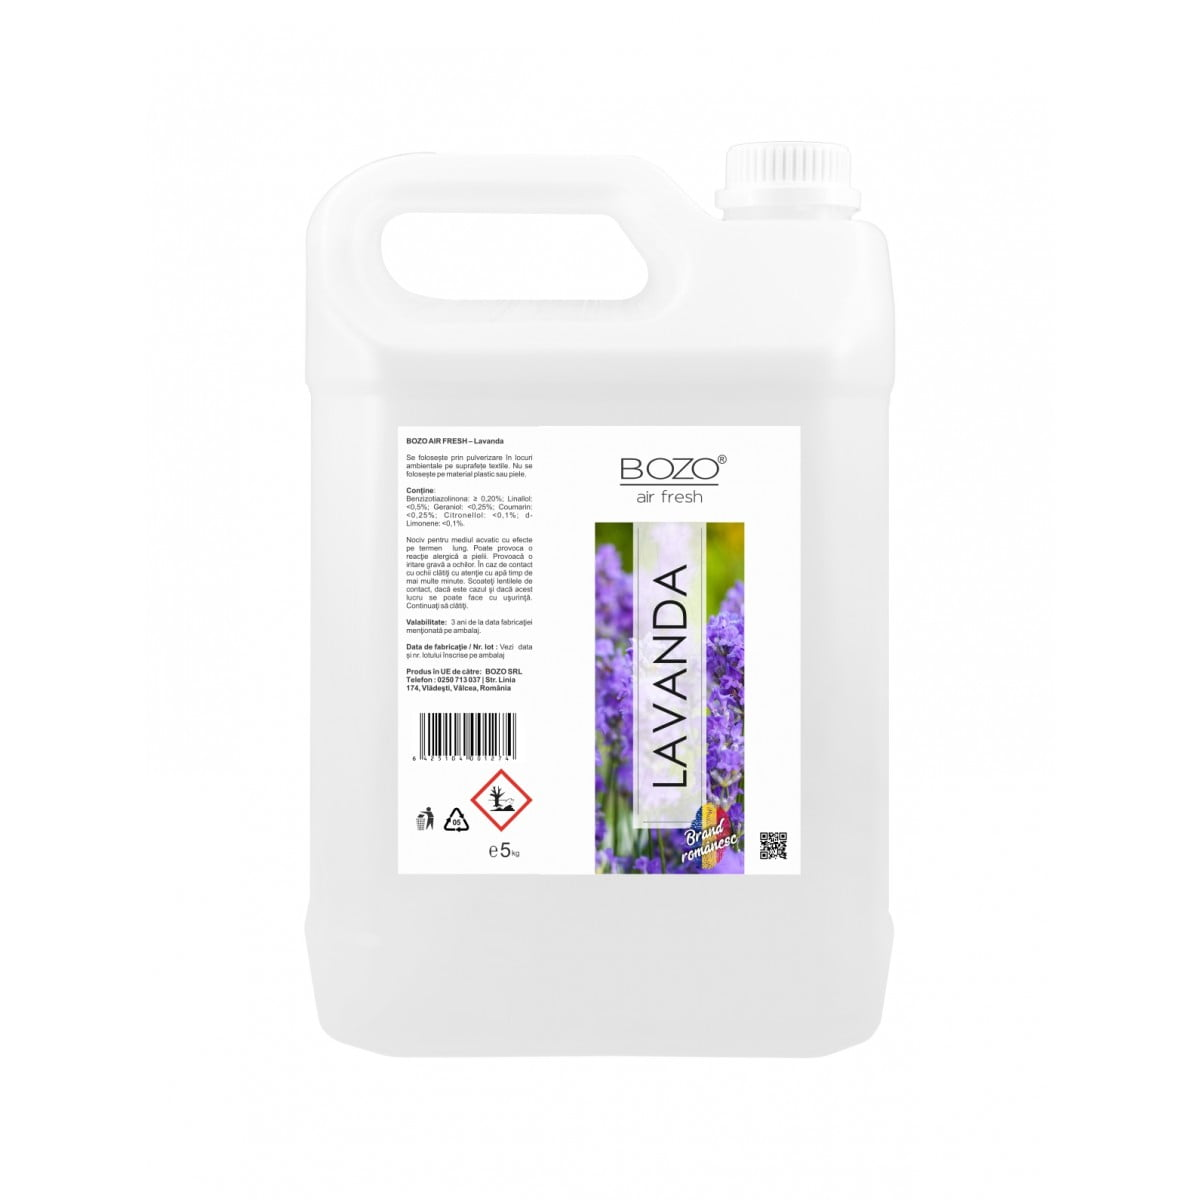 Odorizant ambiental concentrat cu aroma lavanda, Bozo Air Fresh - Lavender - 5 litri imagine 2021 somnart.ro